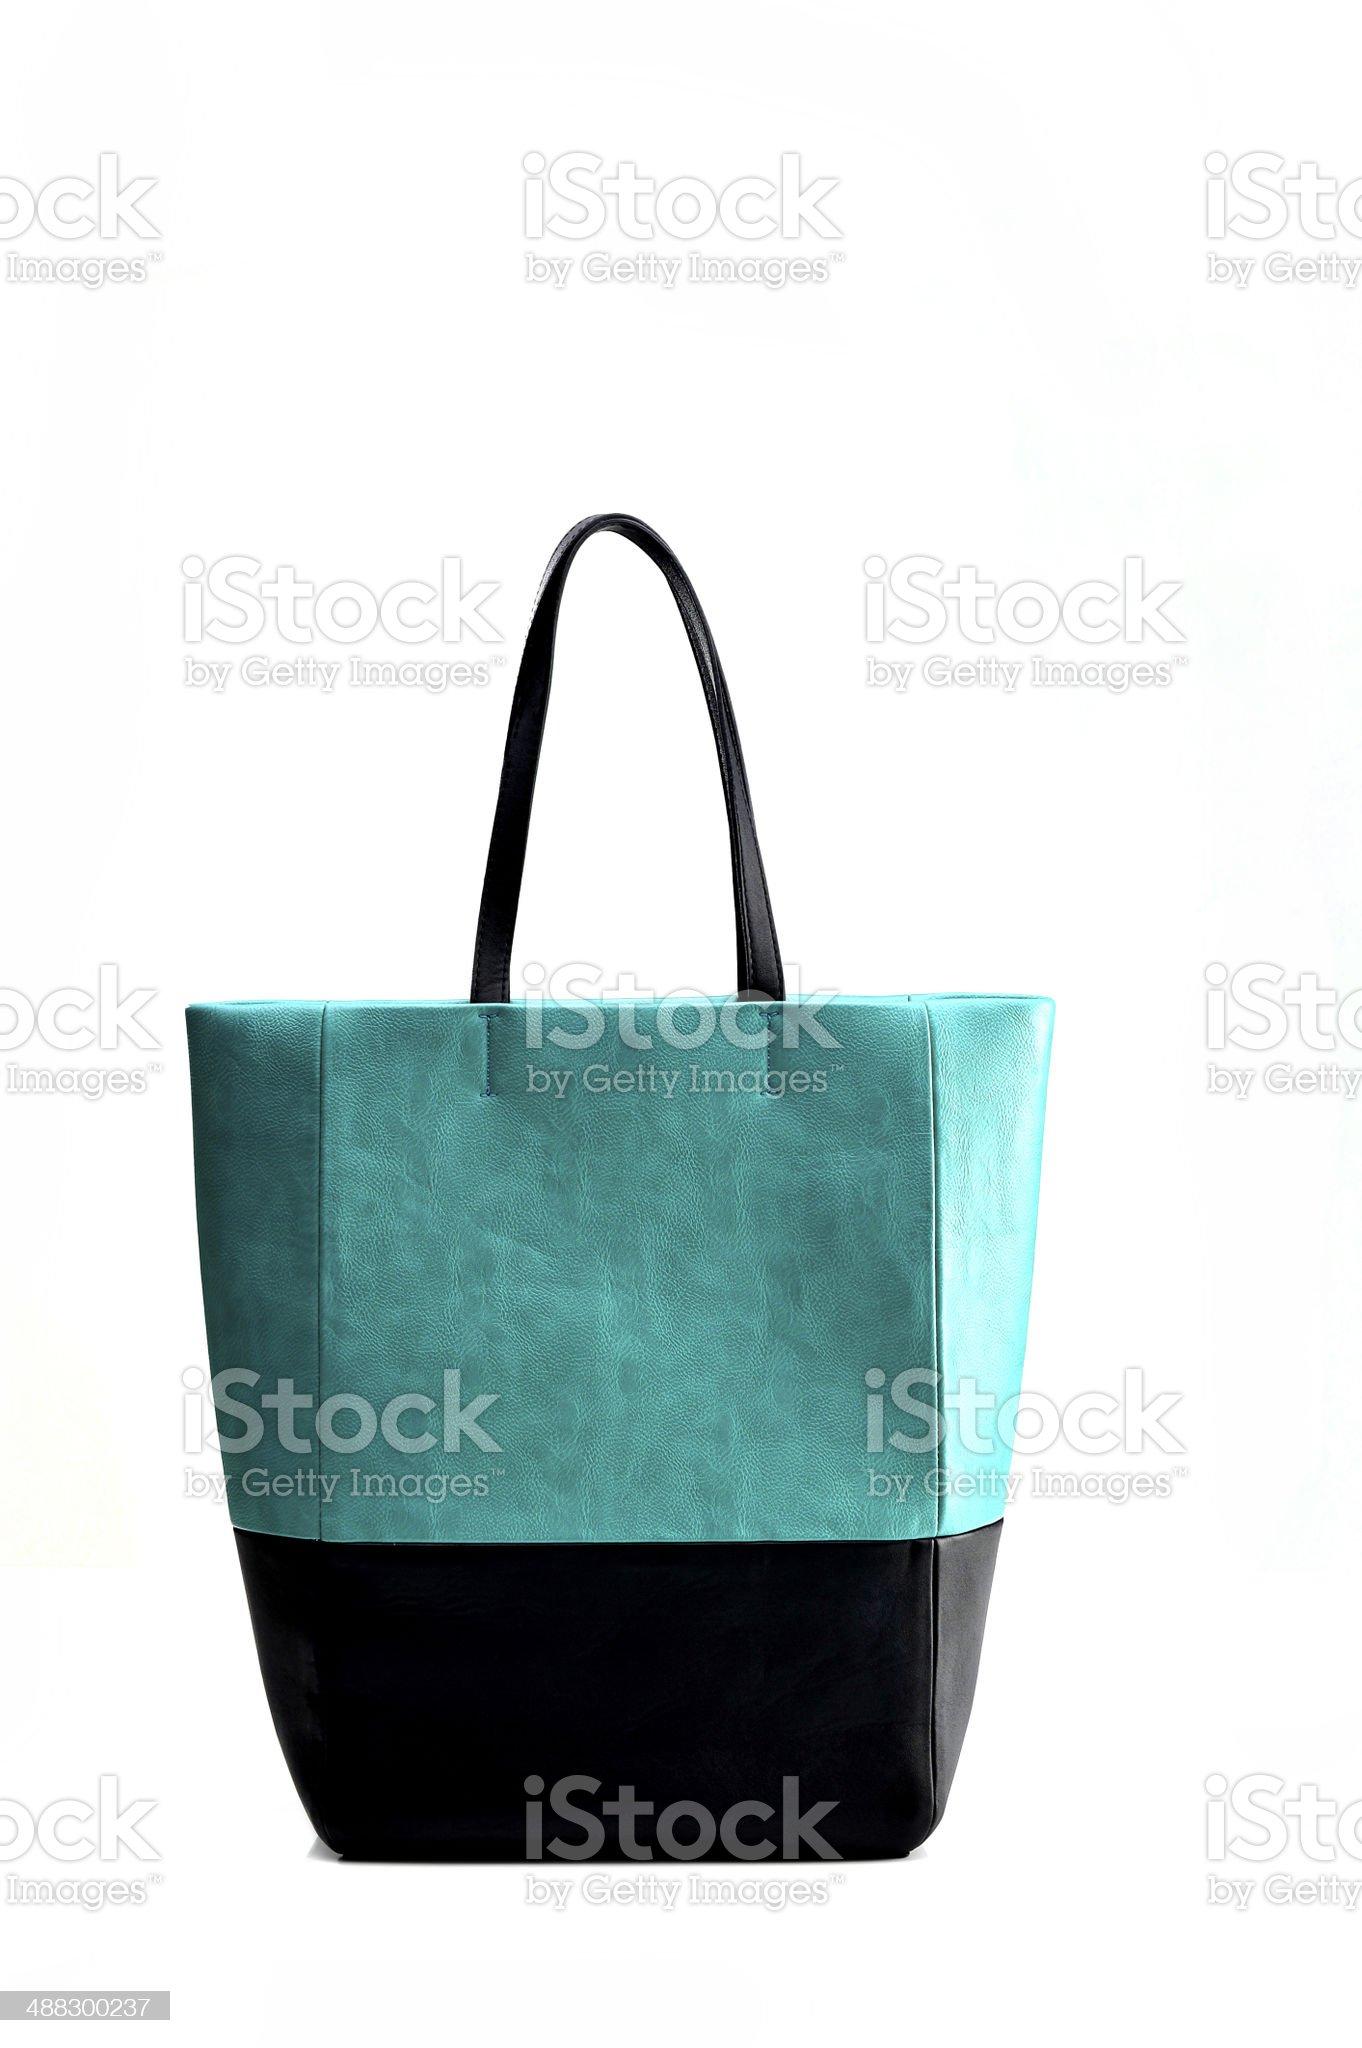 Womens Hand Bag royalty-free stock photo